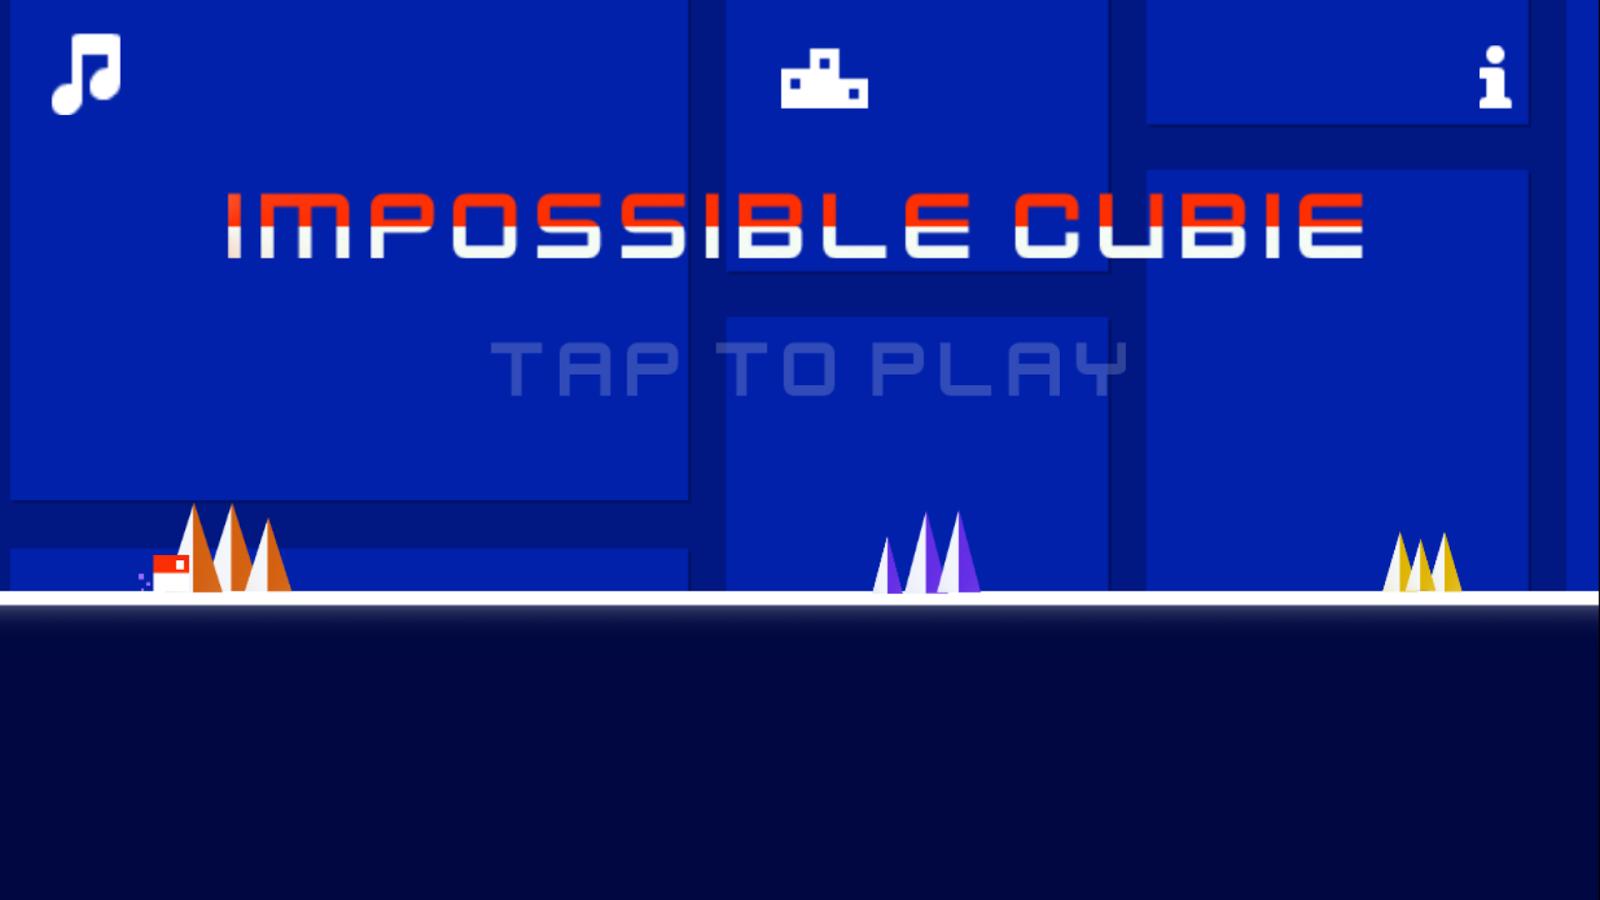 Impossible-Cubie 20